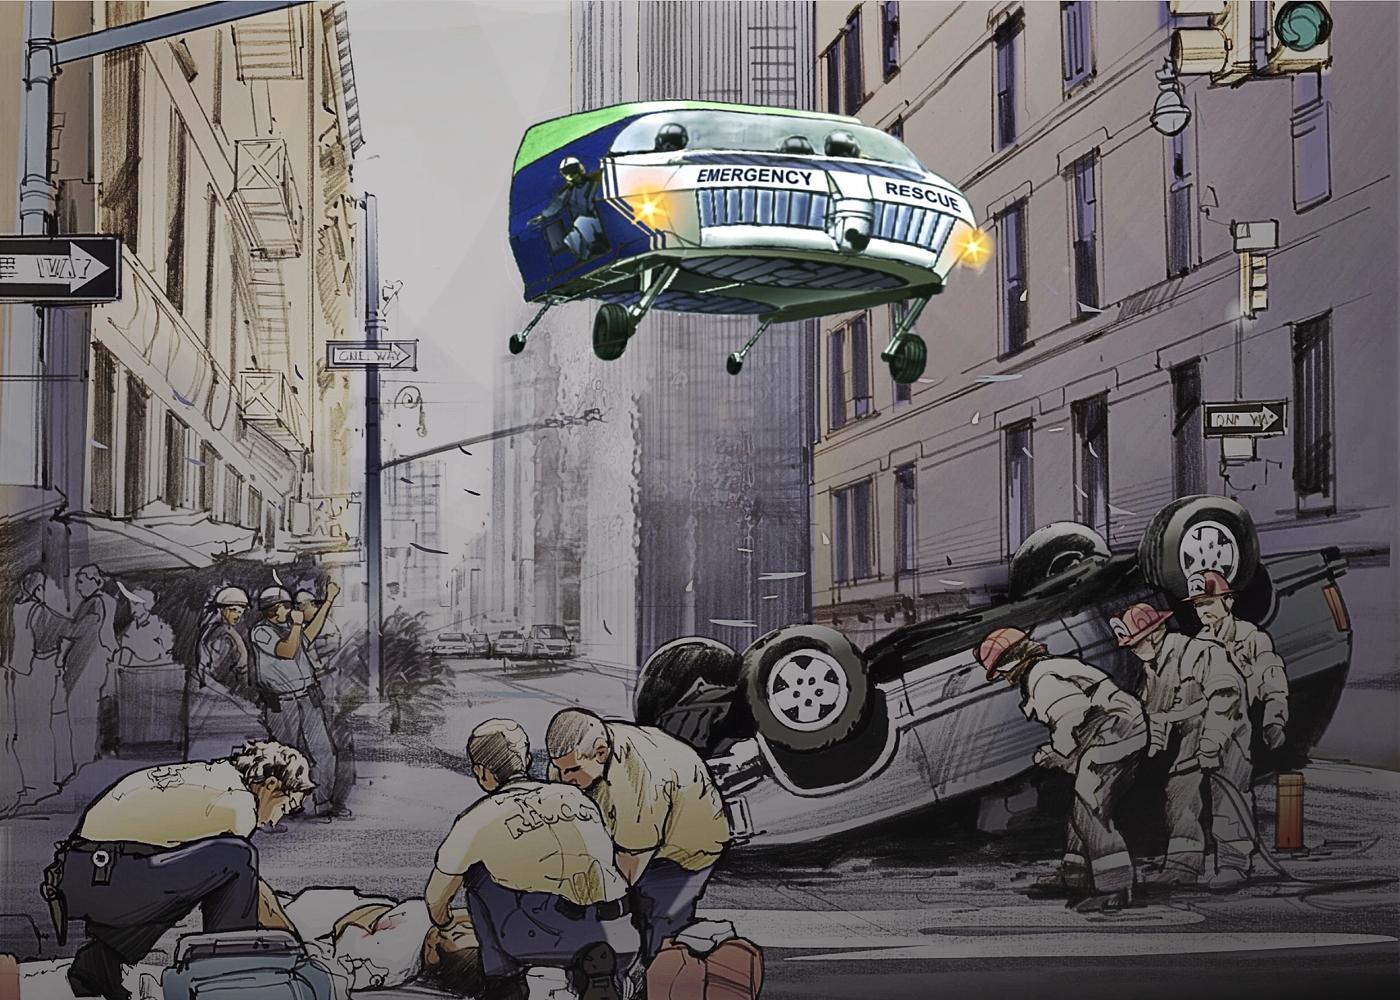 CityHawk EMS scene call